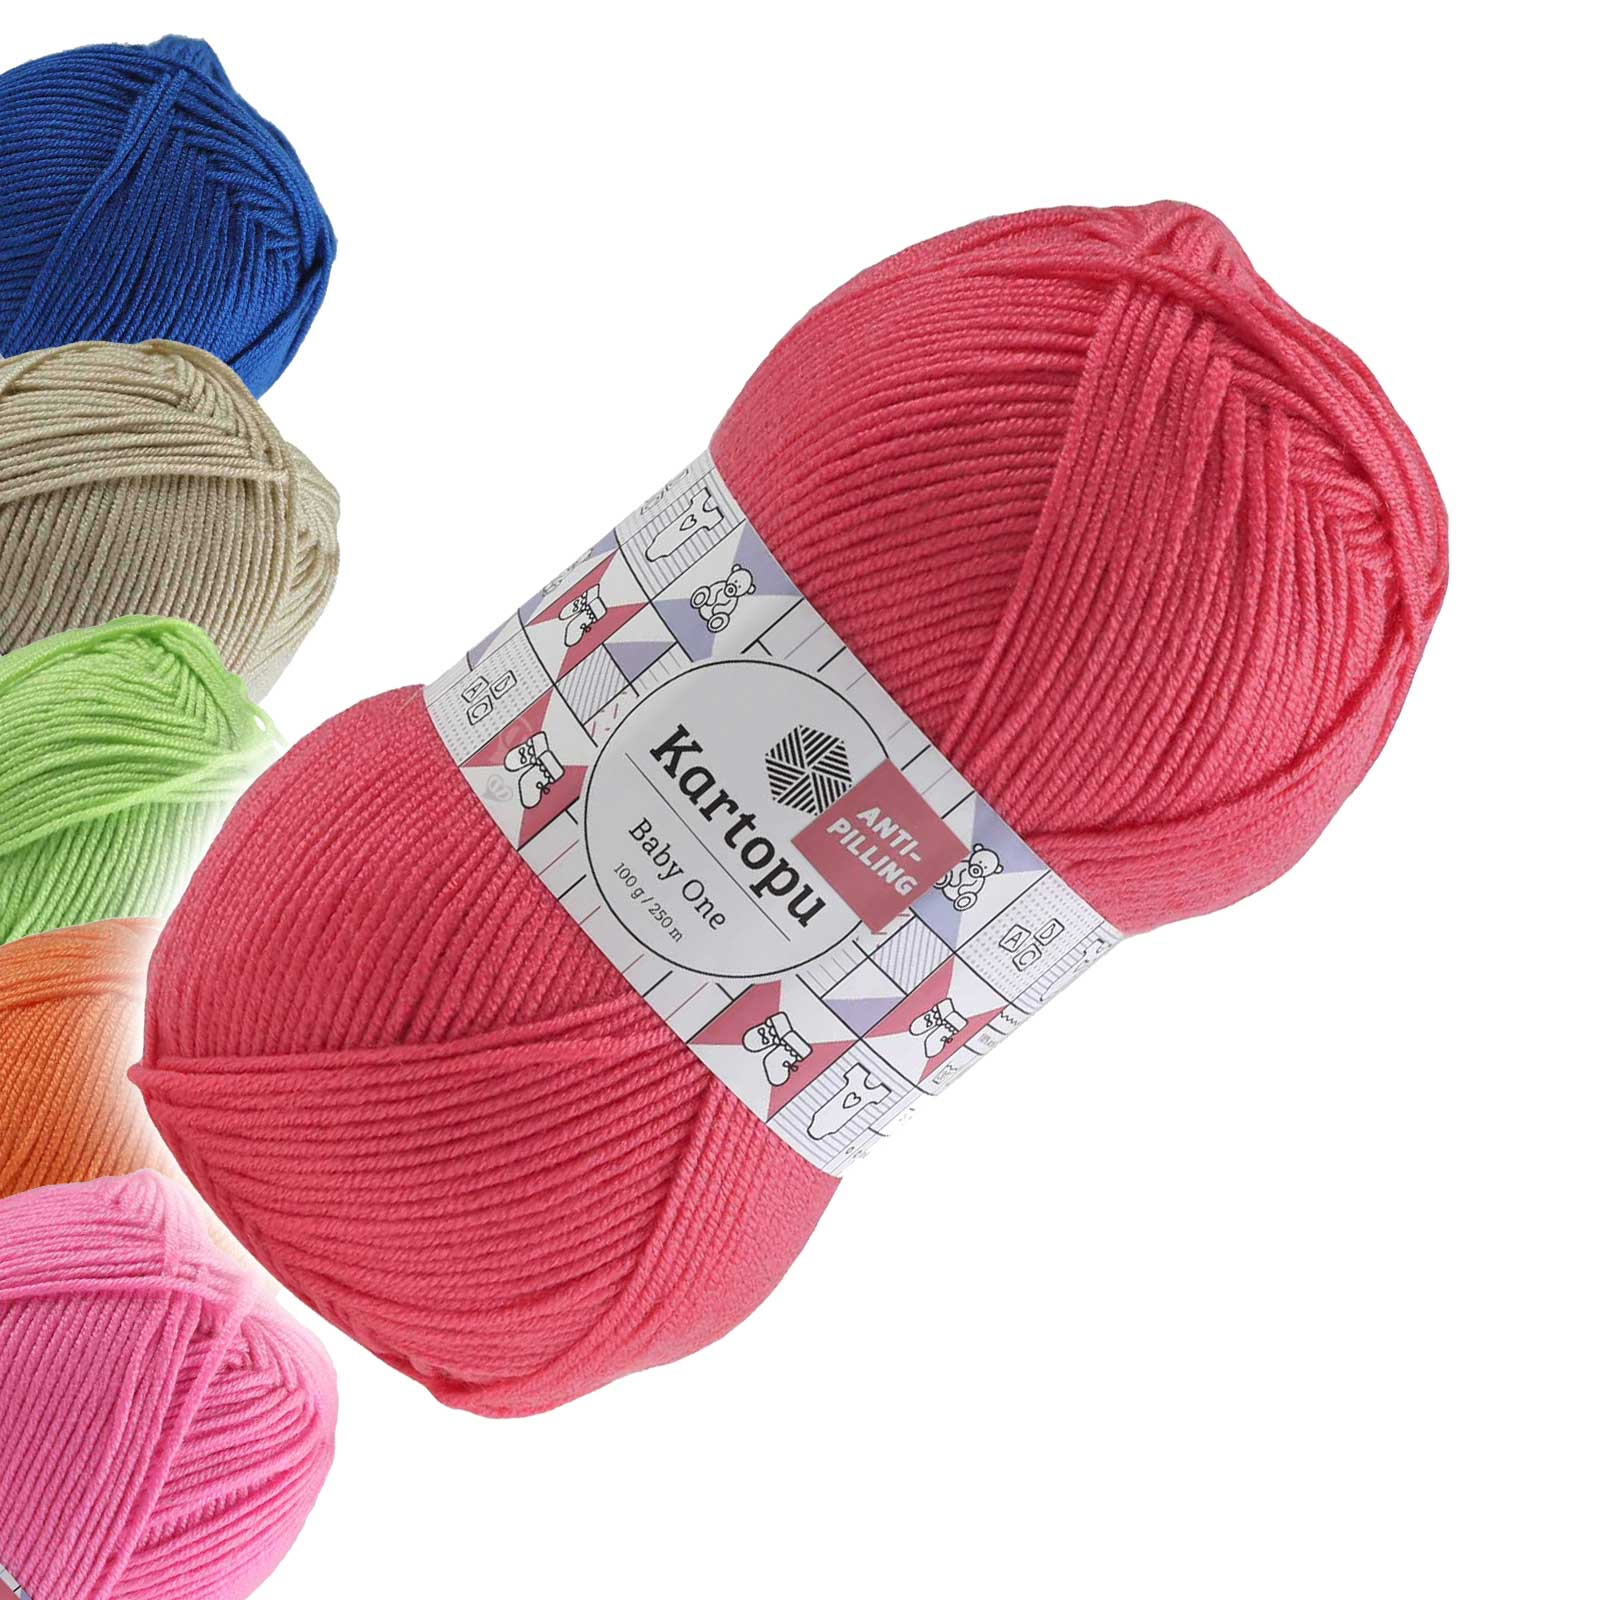 100g Strickgarn Kartopu BABY ONE Antipilling Babywolle Babystrickgarn, Farbwahl – Bild 13